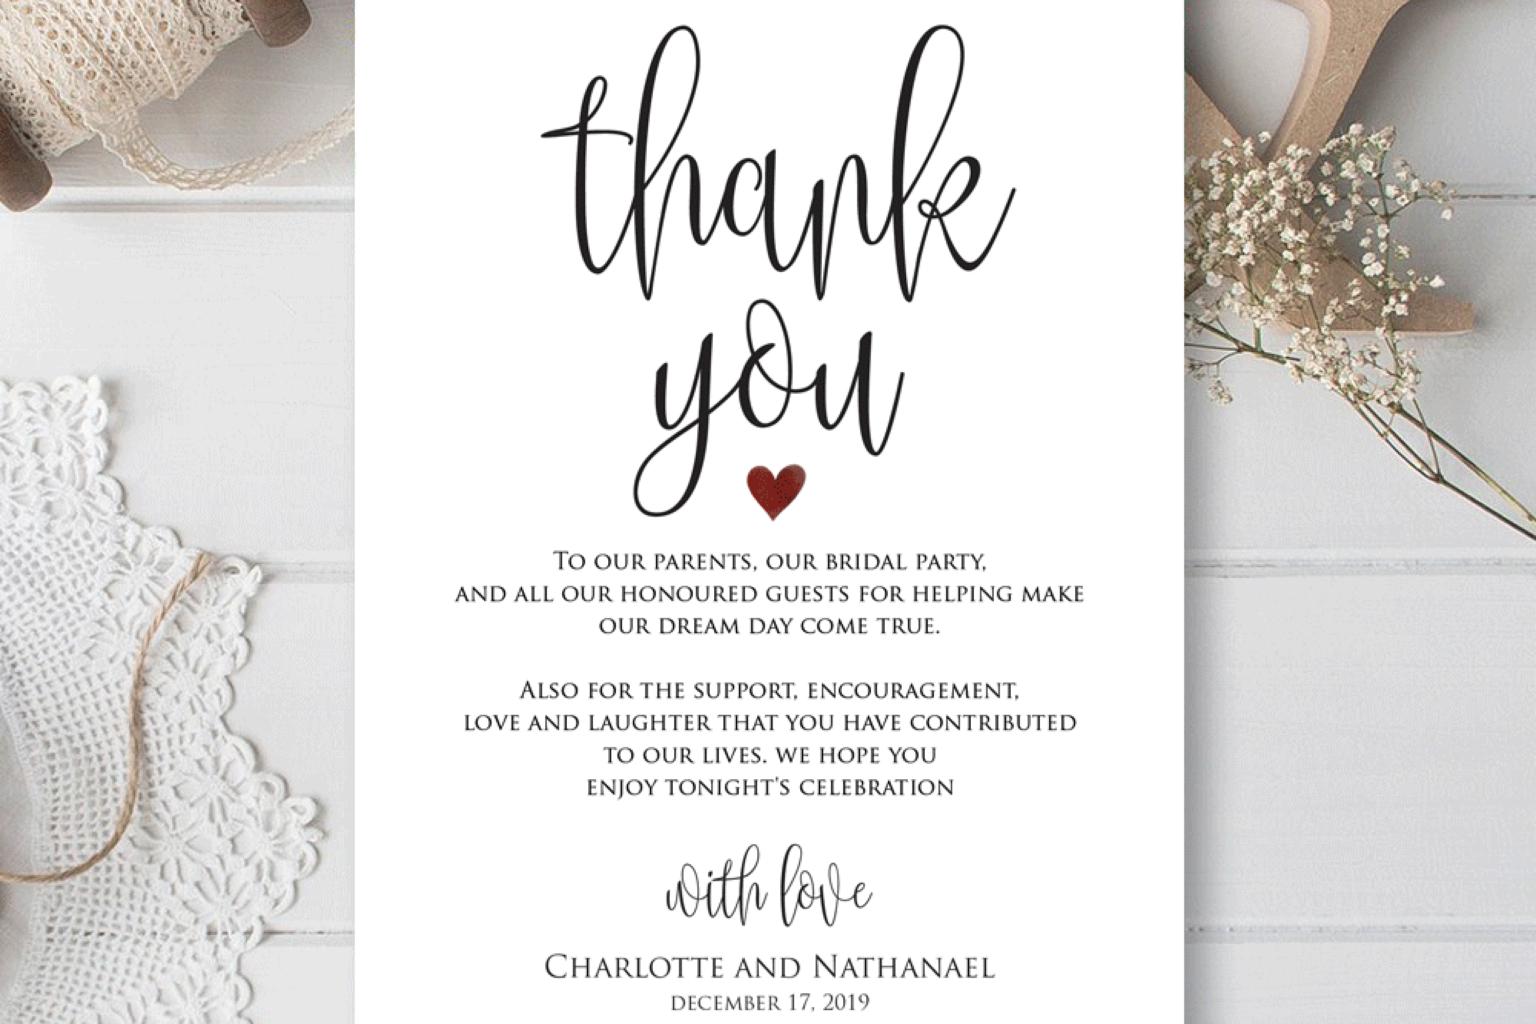 wedding thank you cards template  calepmidnightpigco